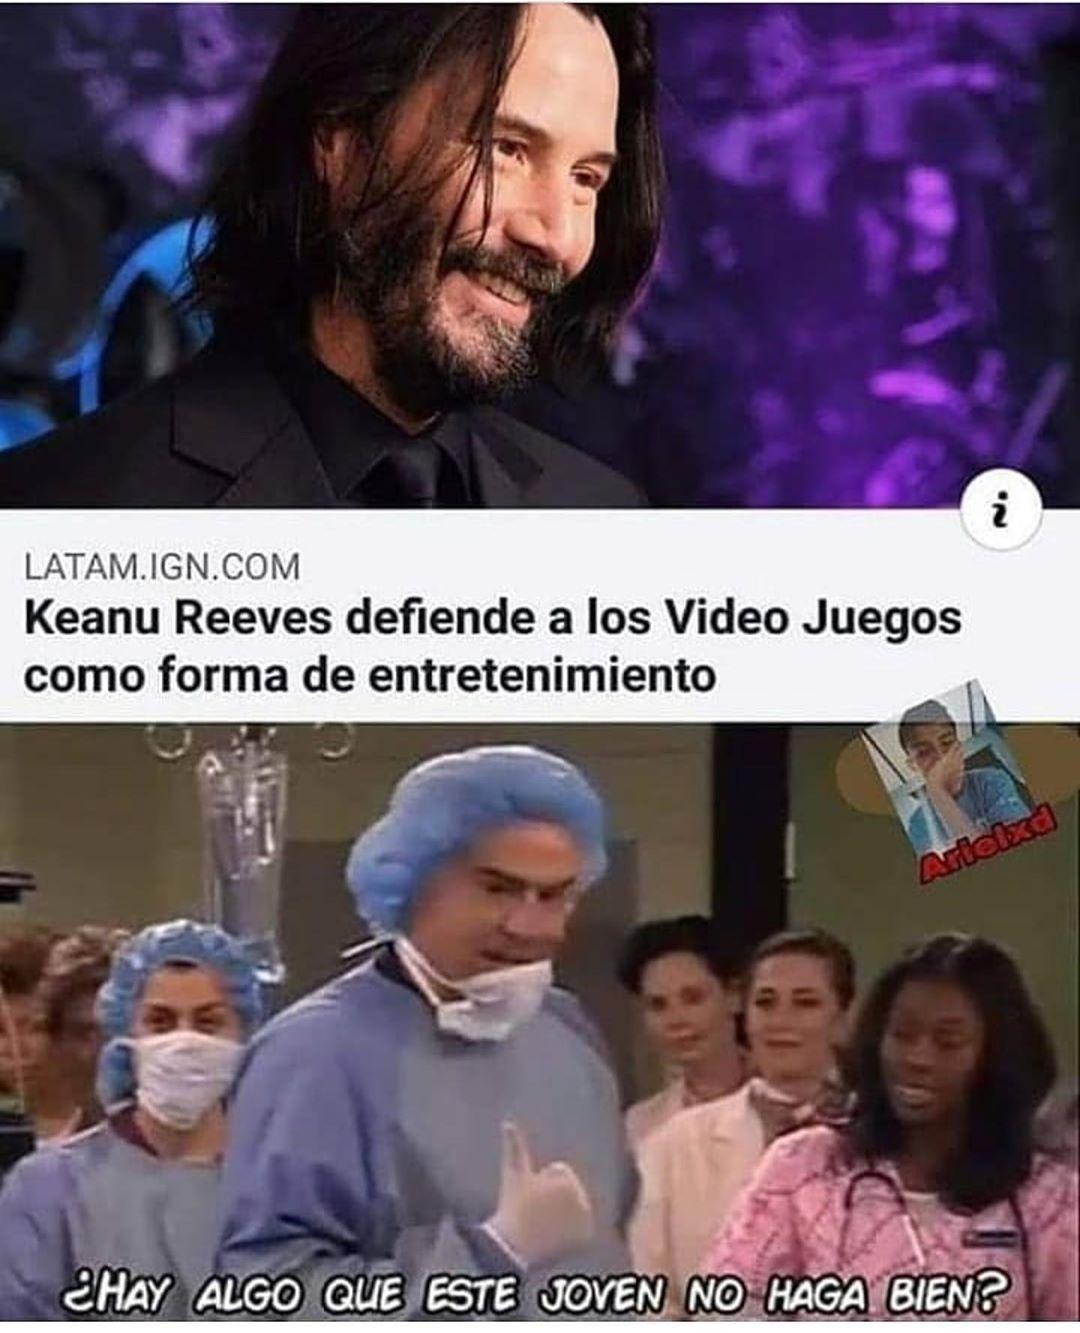 KEANU REEVES EL PVTO AMO - meme